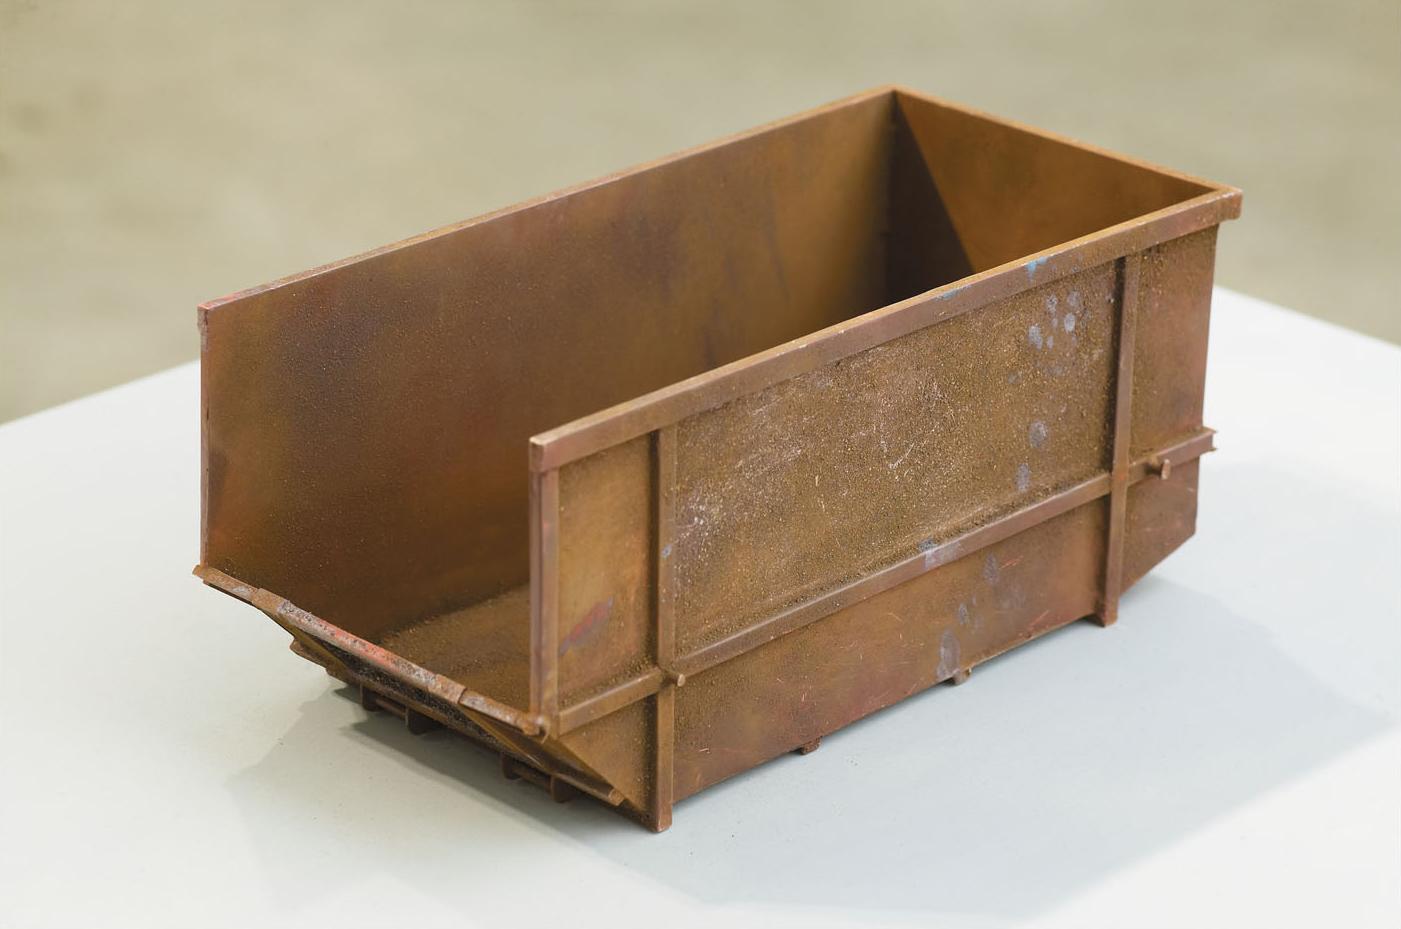 BROWN SKIP Enamel on Steel, Brass & Plywood 113.5 x 66 x 54 cm